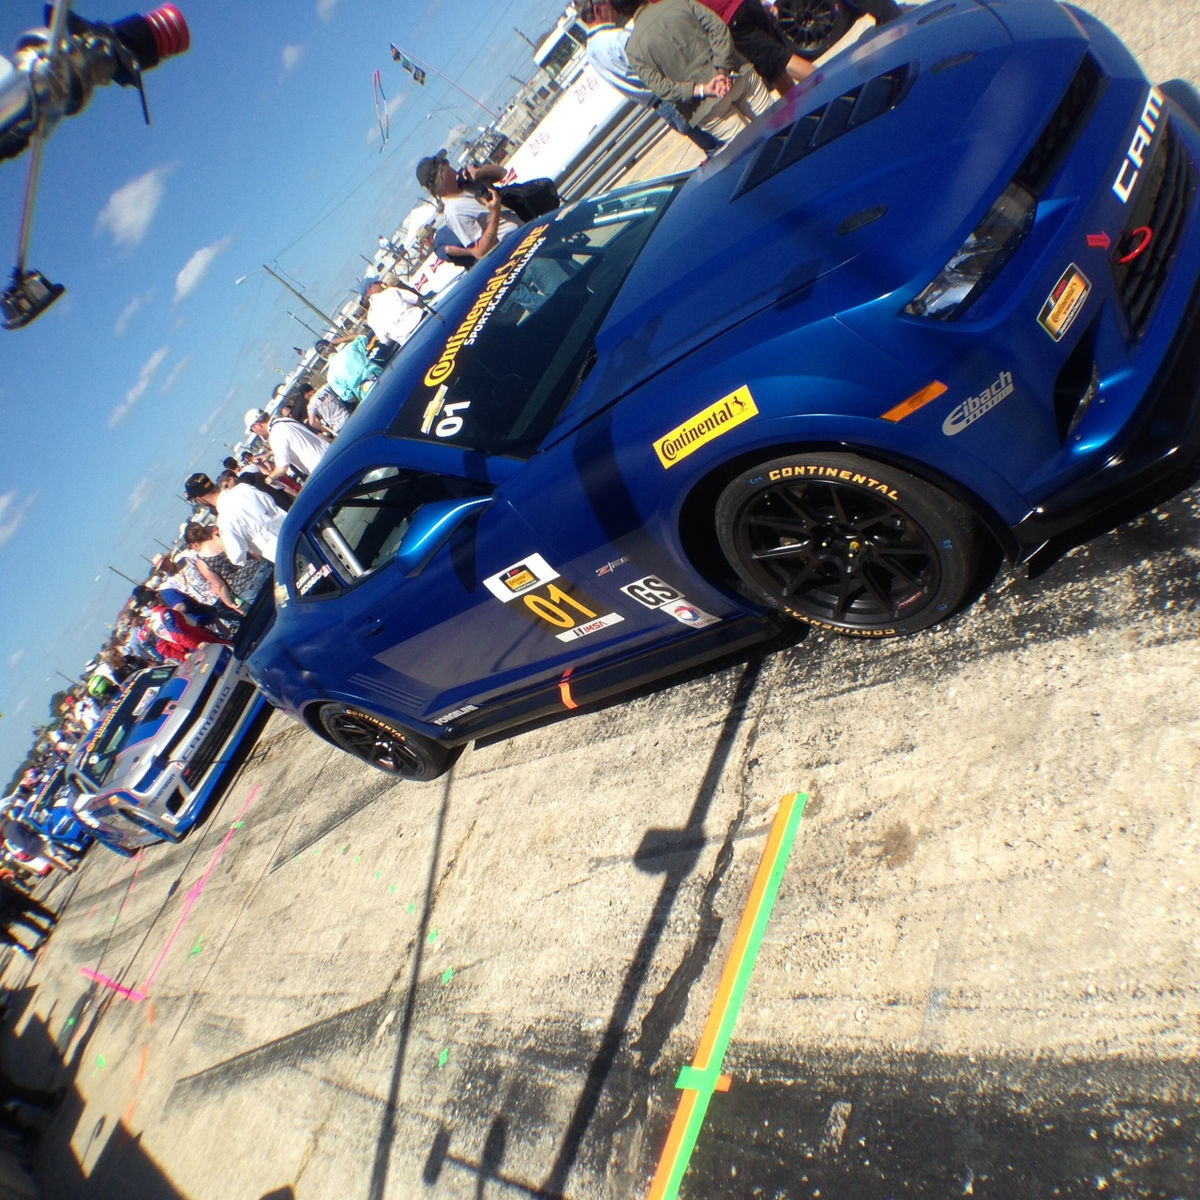 2014 Chevrolet Camaro | CKS Autosport and Stevenson Motorsport Camaro Z28s on the Grid at Sebring